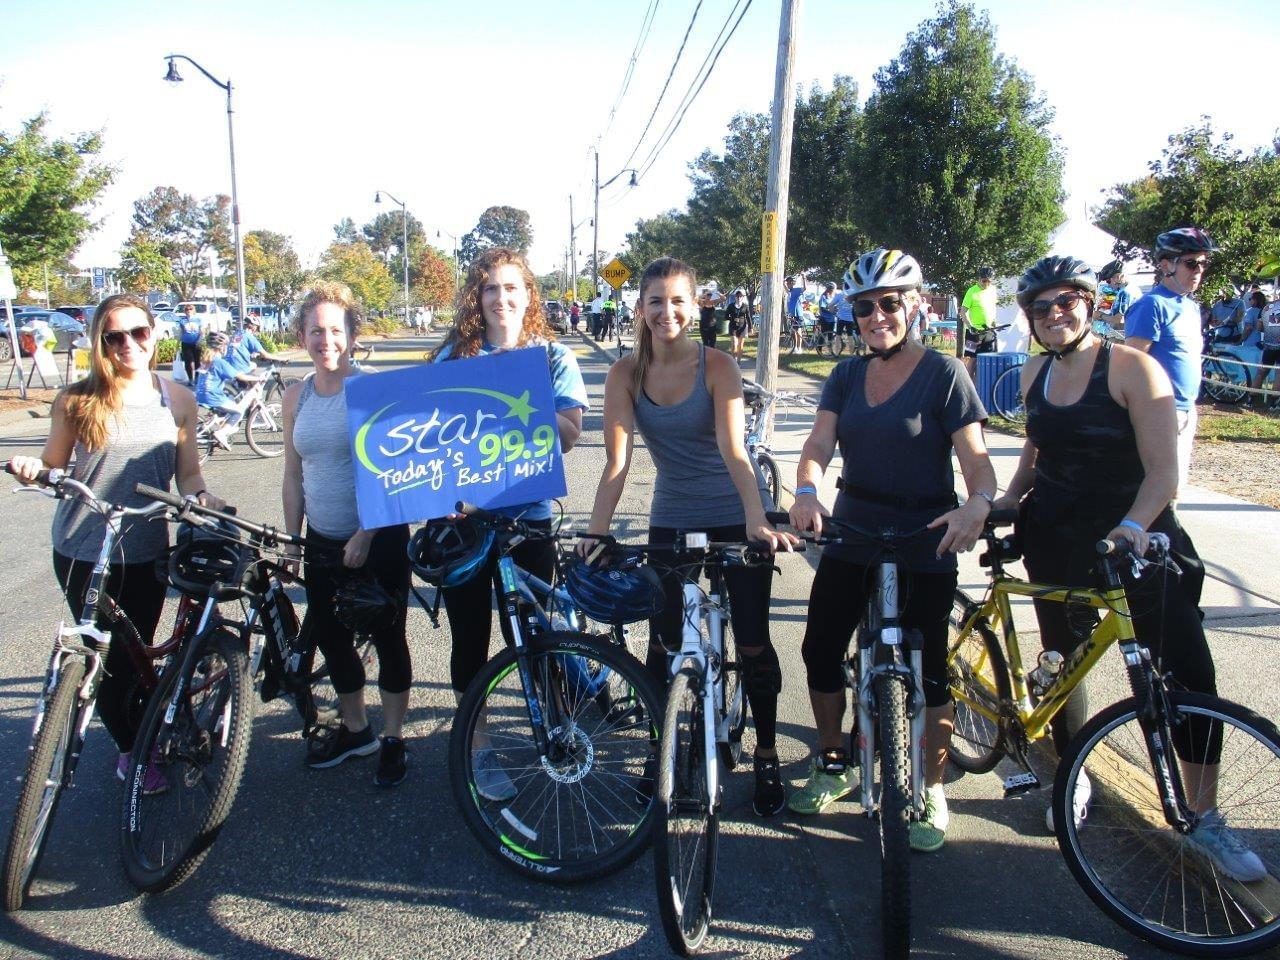 William Raveis Walk and Ride Event 9/29/19